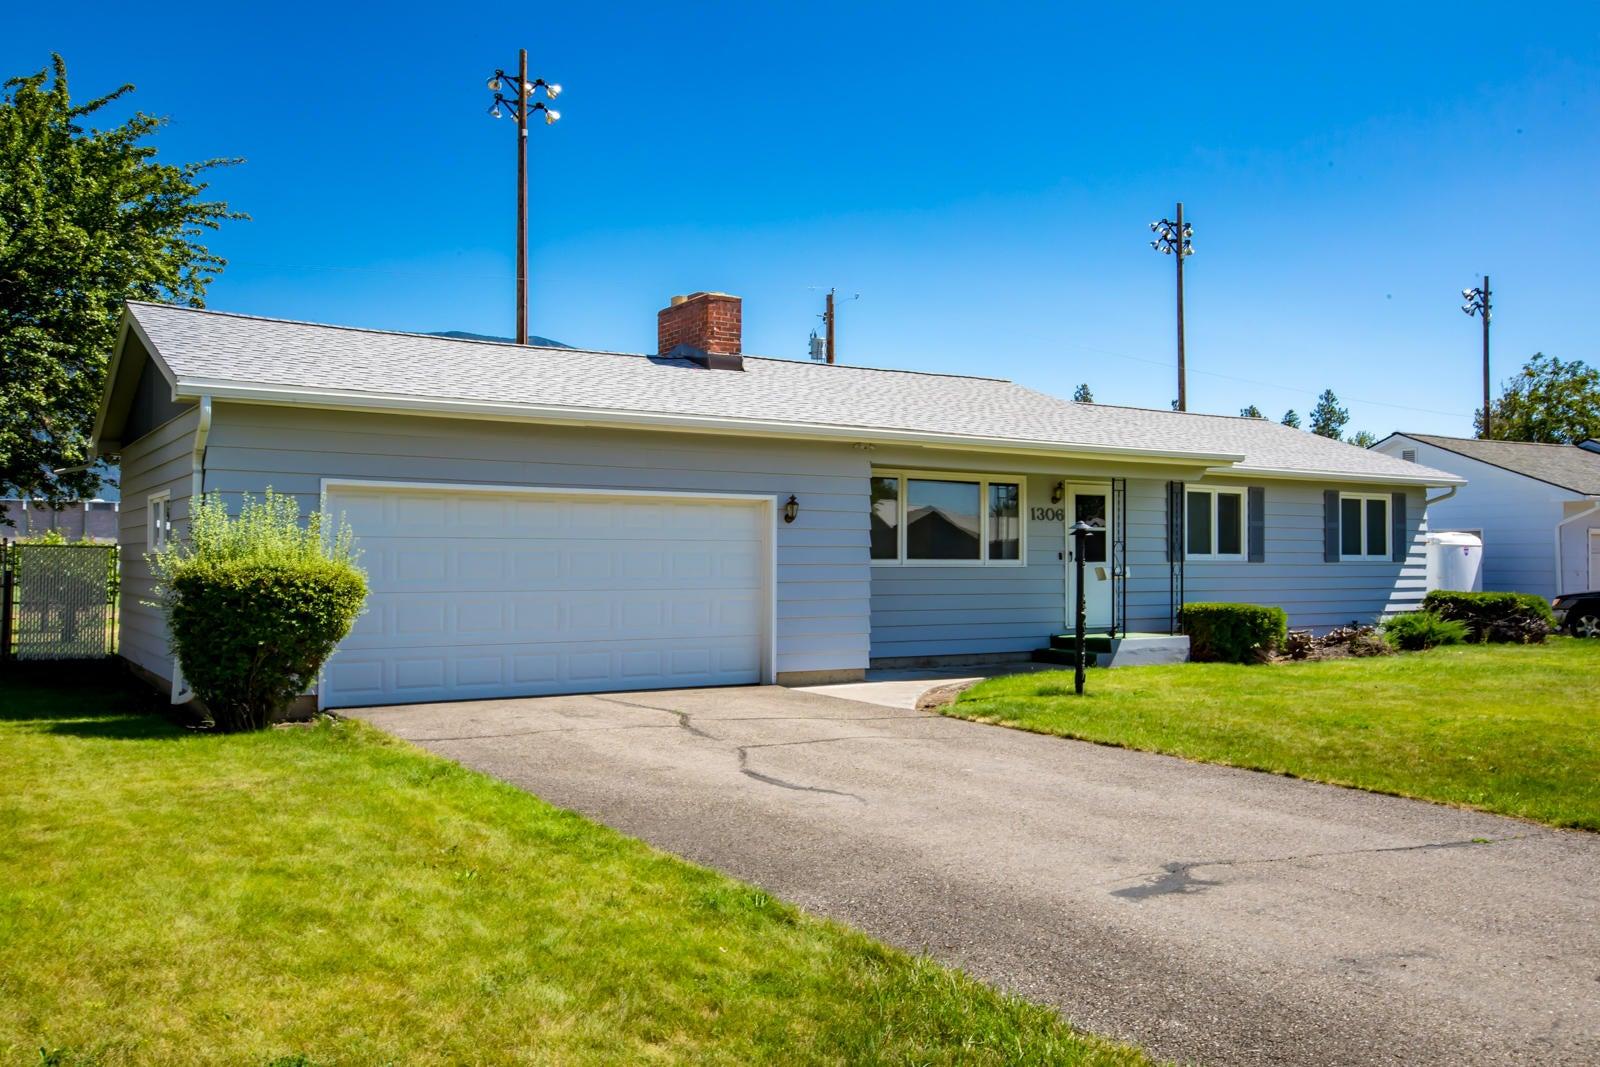 1306 Columbia Drive, Columbia Falls, MT 59912